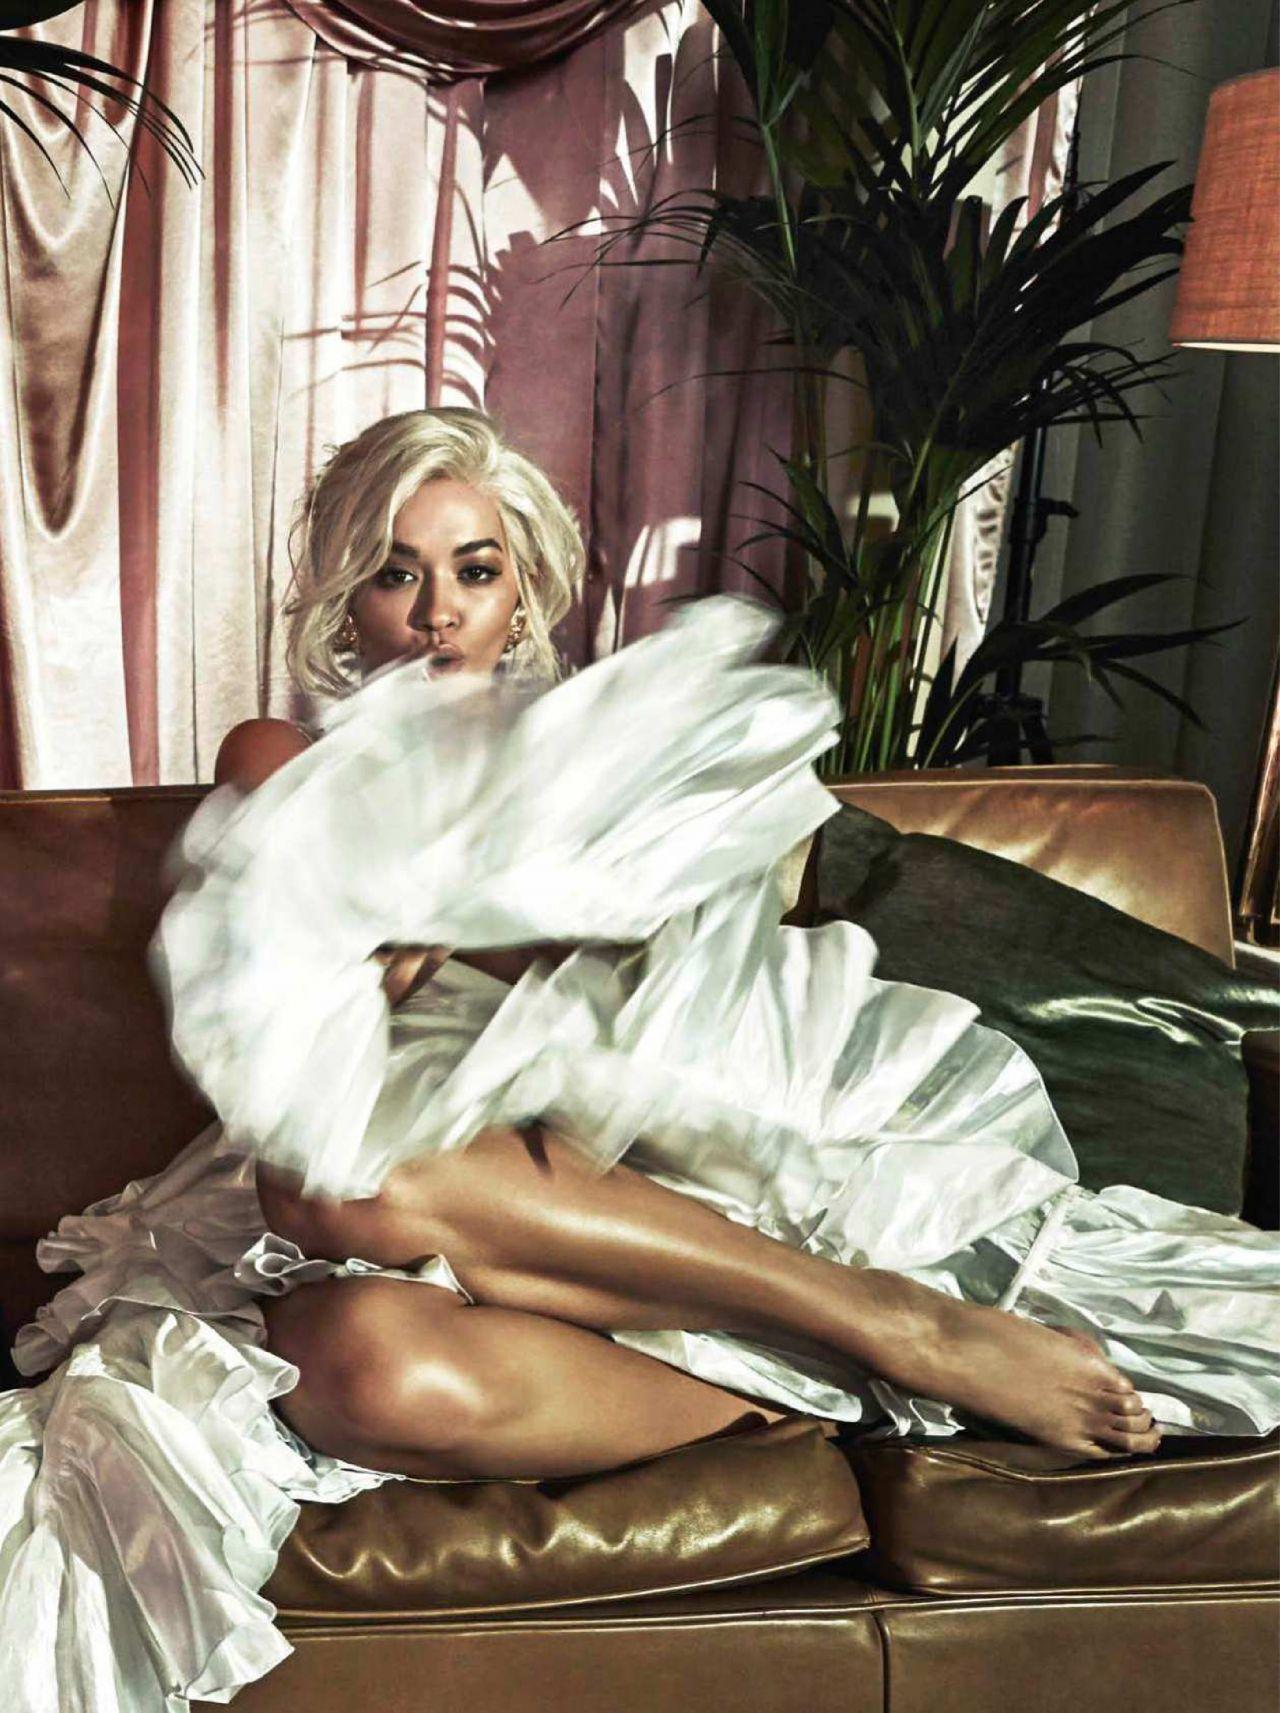 https://celebmafia.com/wp-content/uploads/2018/11/rita-ora-glamour-magazine-spain-11-2018-1.jpg